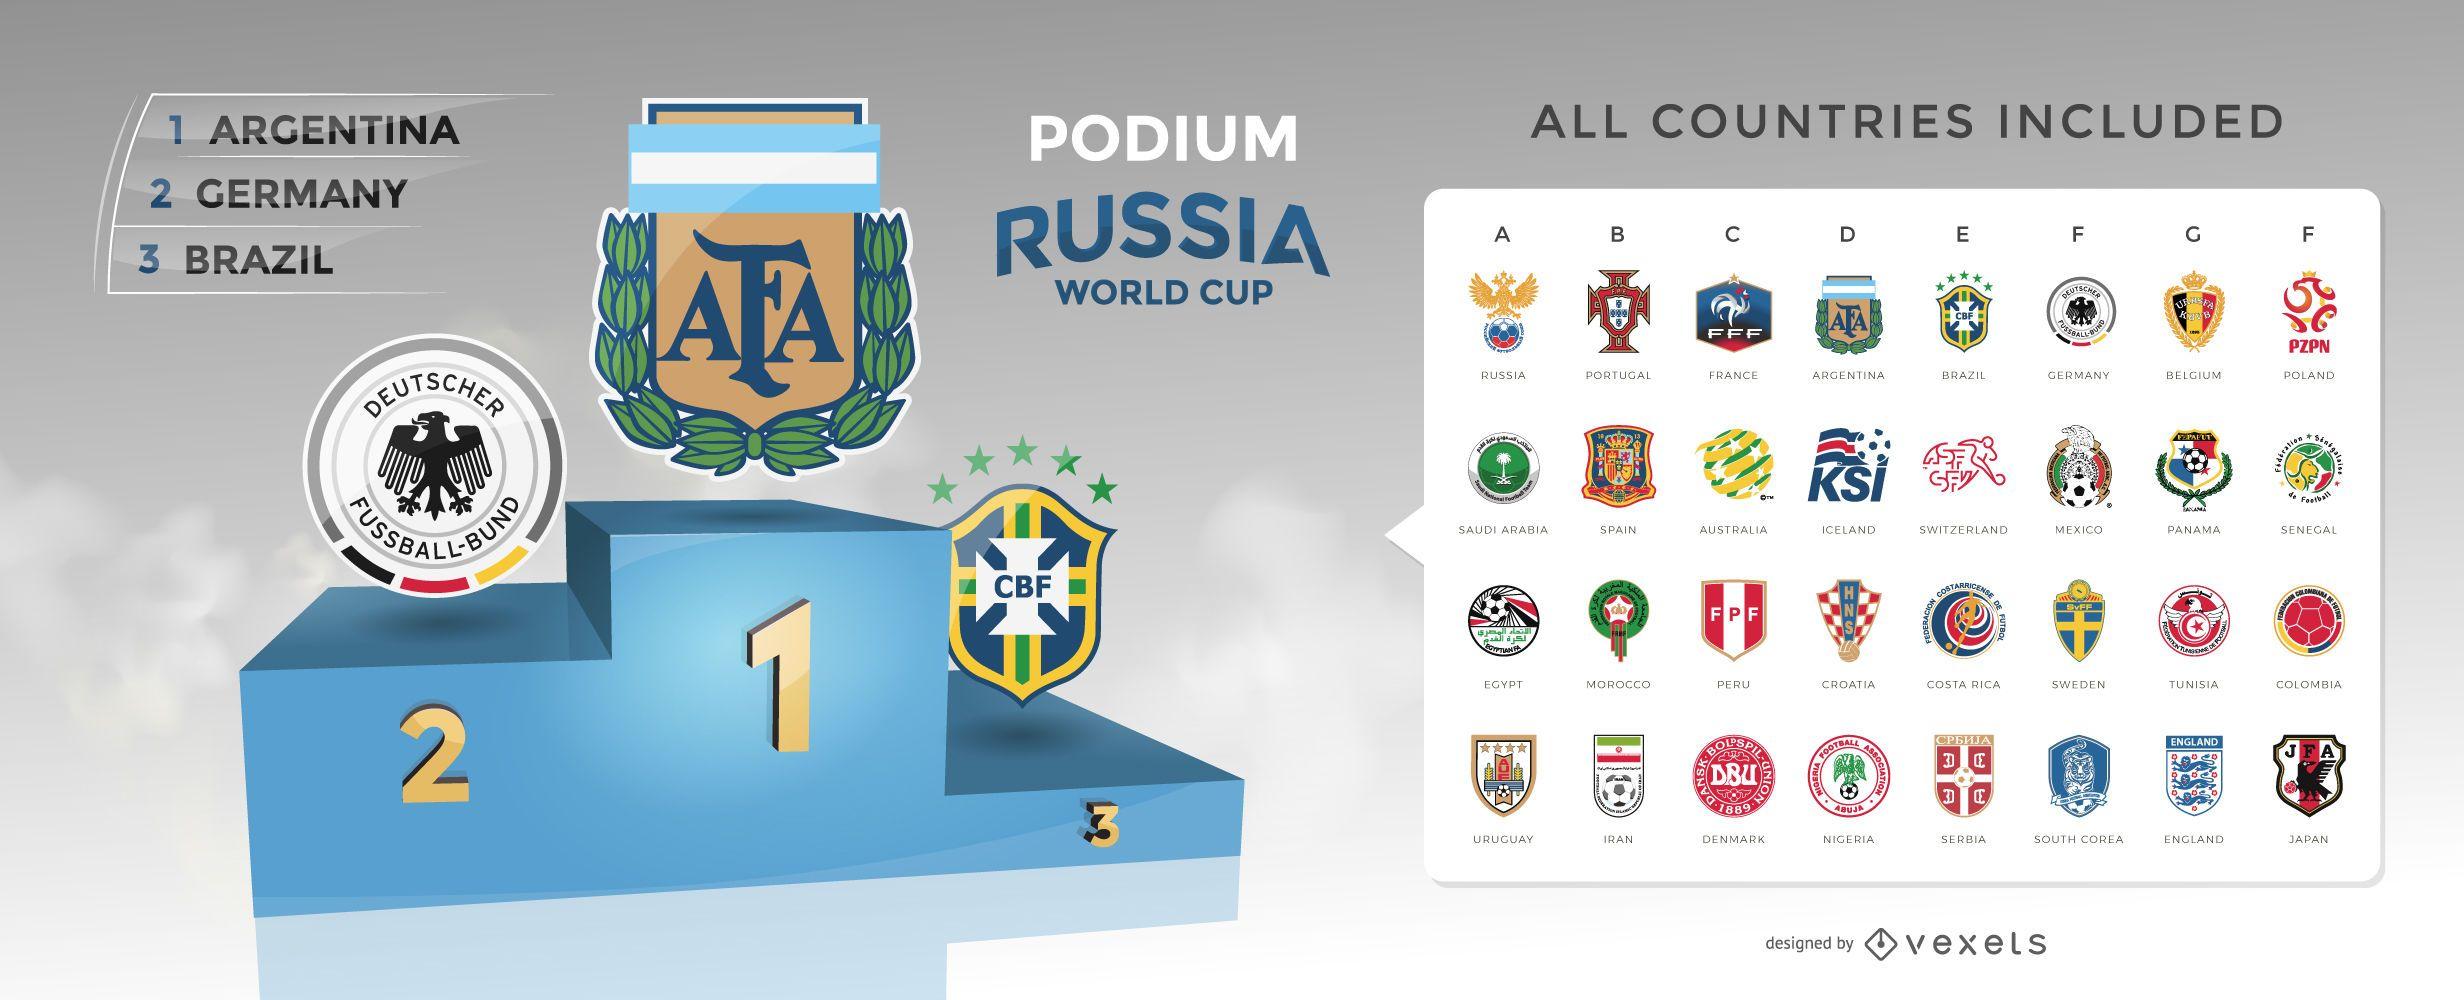 Football World Cup national teams